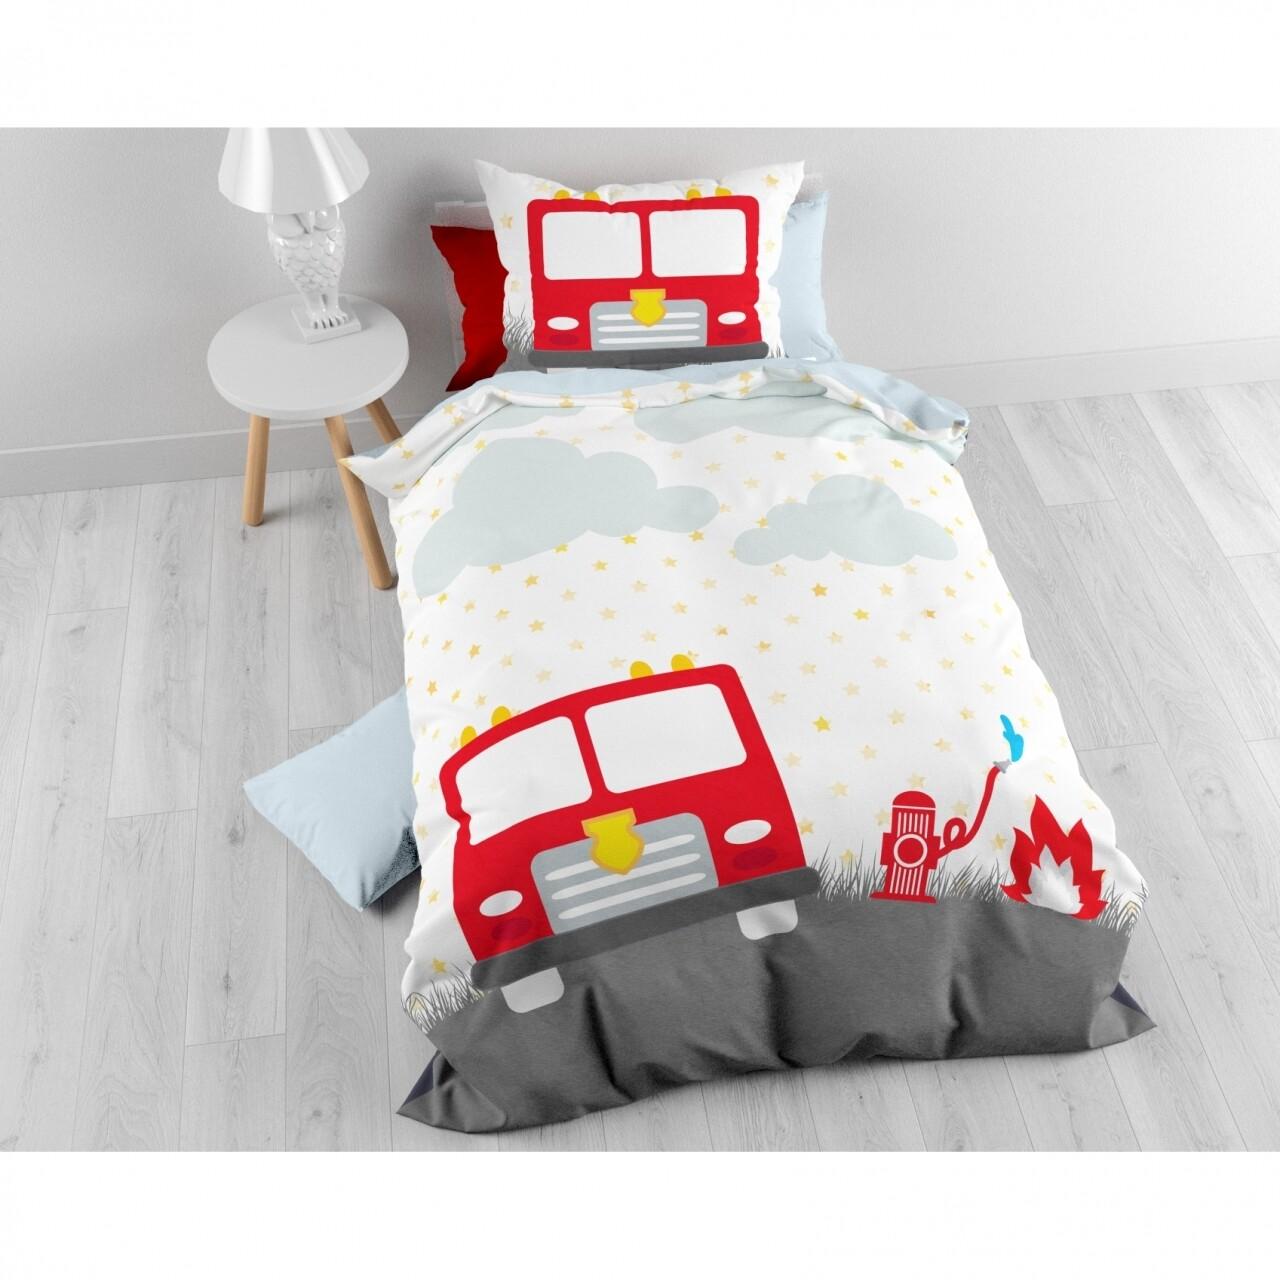 Lenjerie de pat pentru o persoana, Small Fireman White, Royal Textile, 2 piese, 140 x 200 cm, 100% bumbac, multicolora